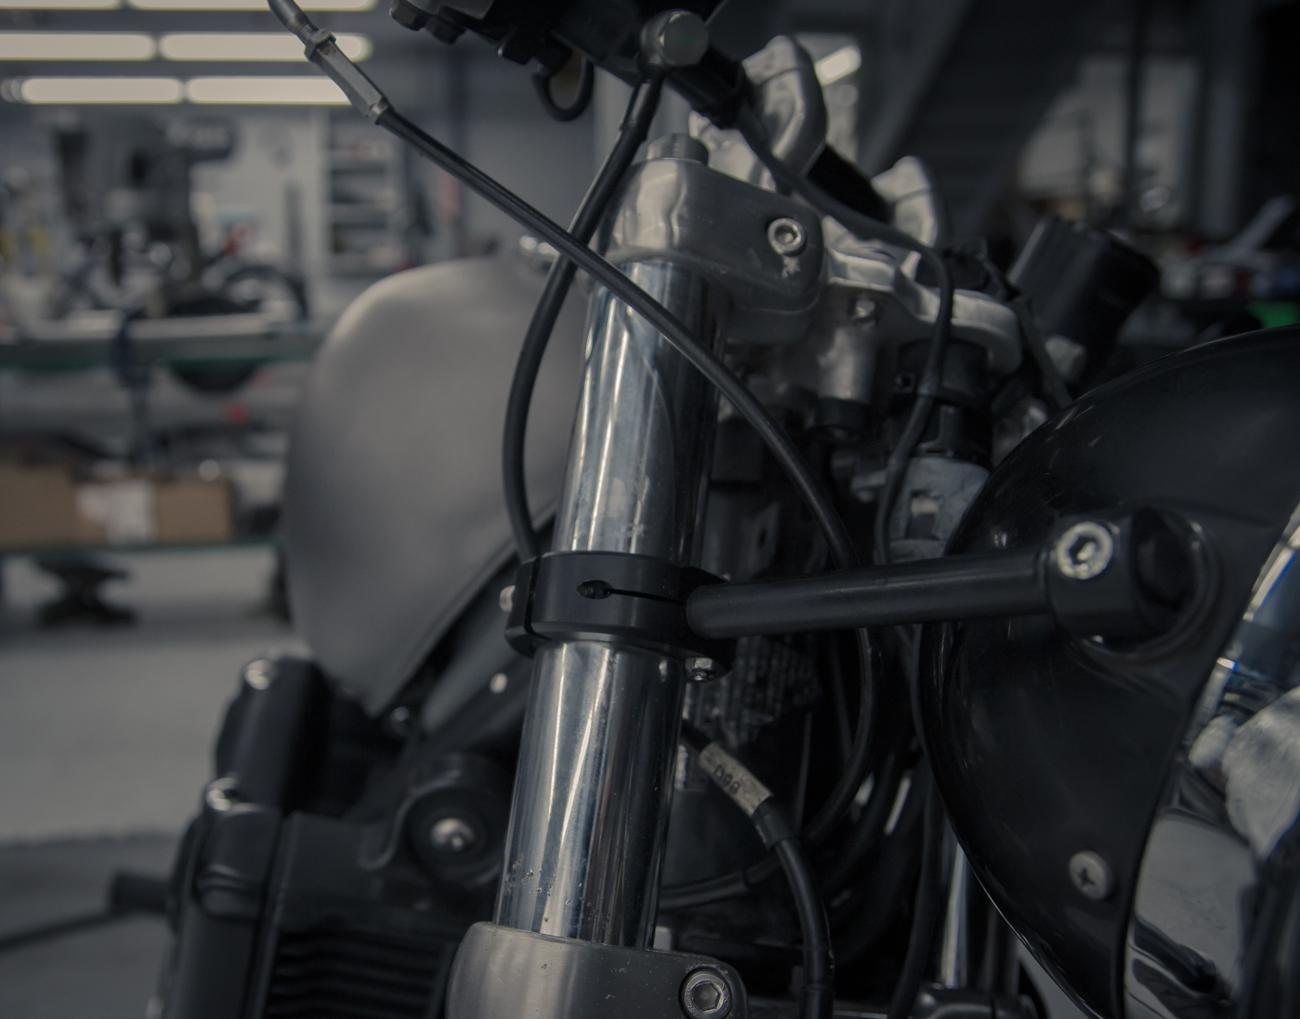 truimph custom seat rear fender atx moto-7.jpg